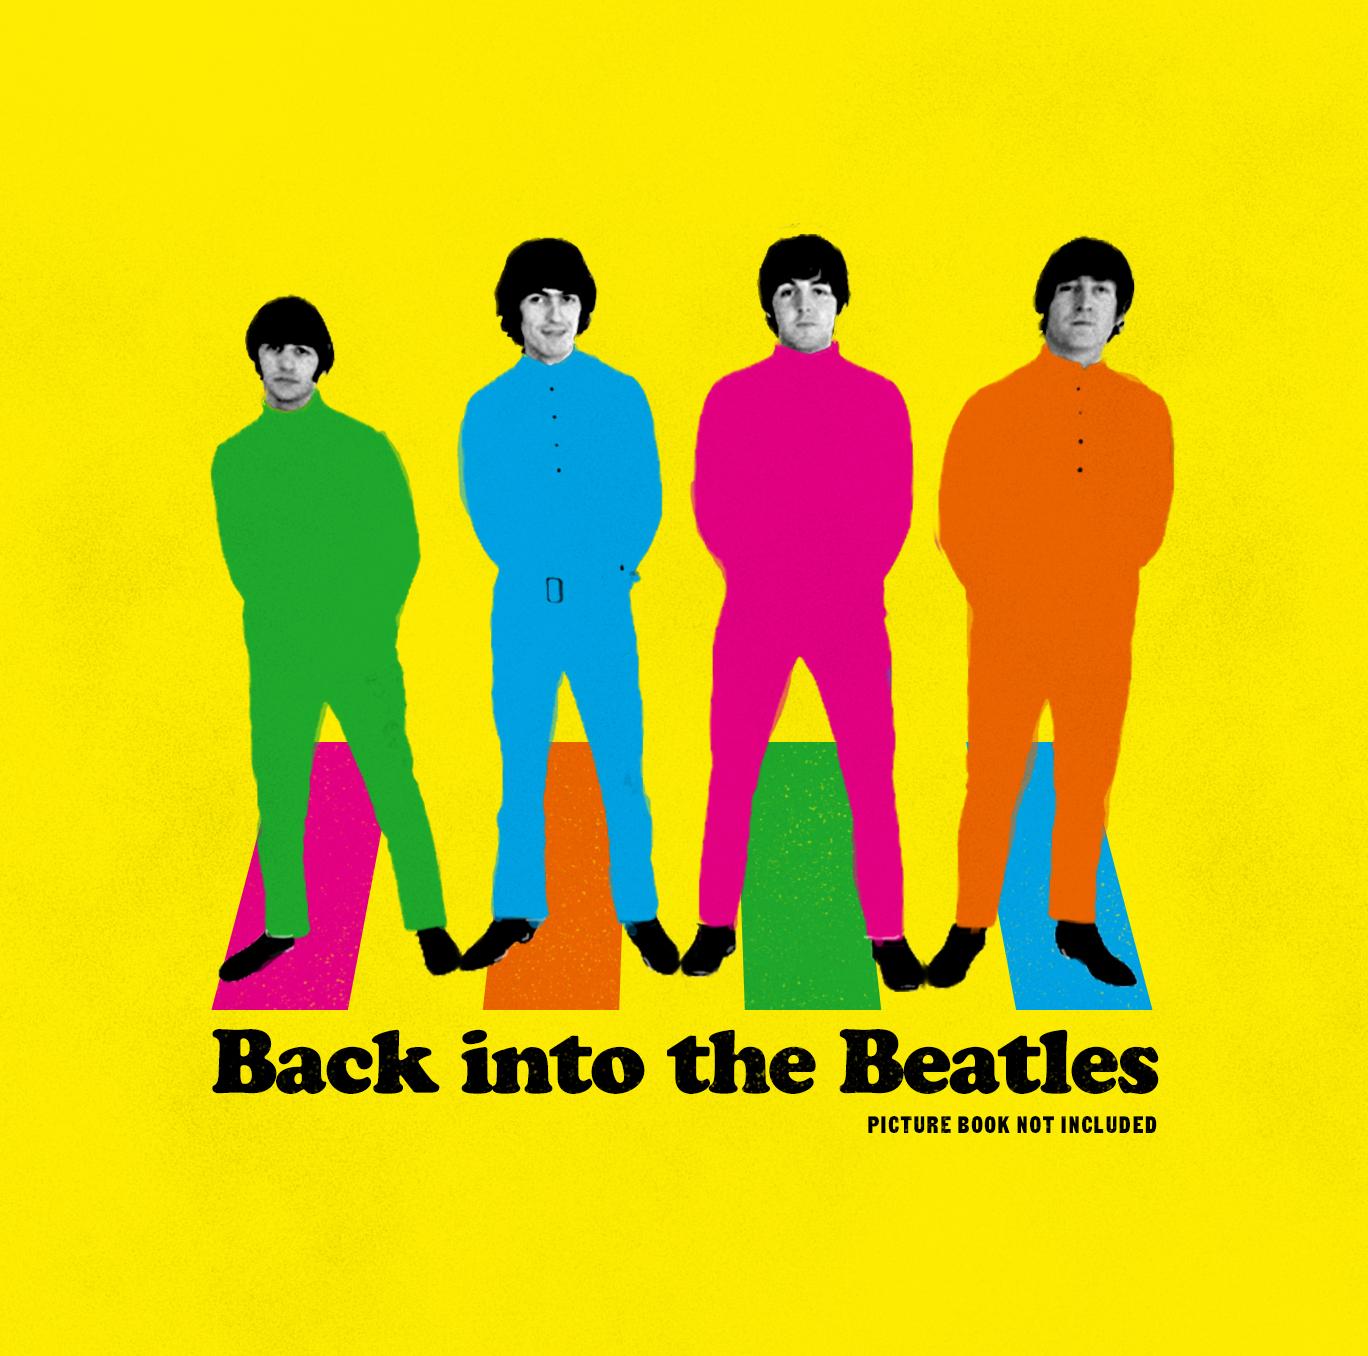 Back-into-The-Beatles-w-border.jpg